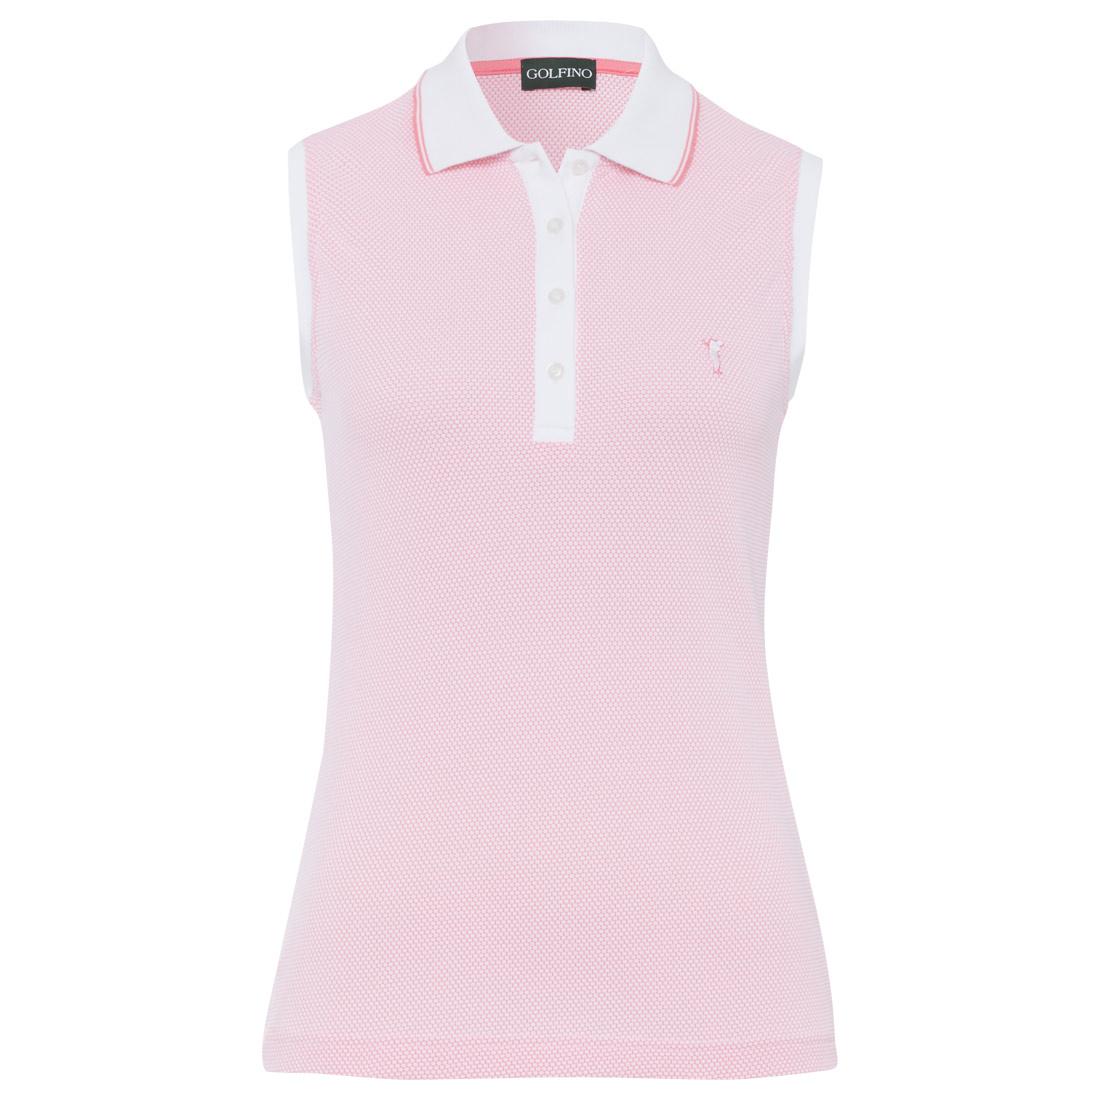 Ärmellose Damen Golfpolo leicht und atmungsaktiv